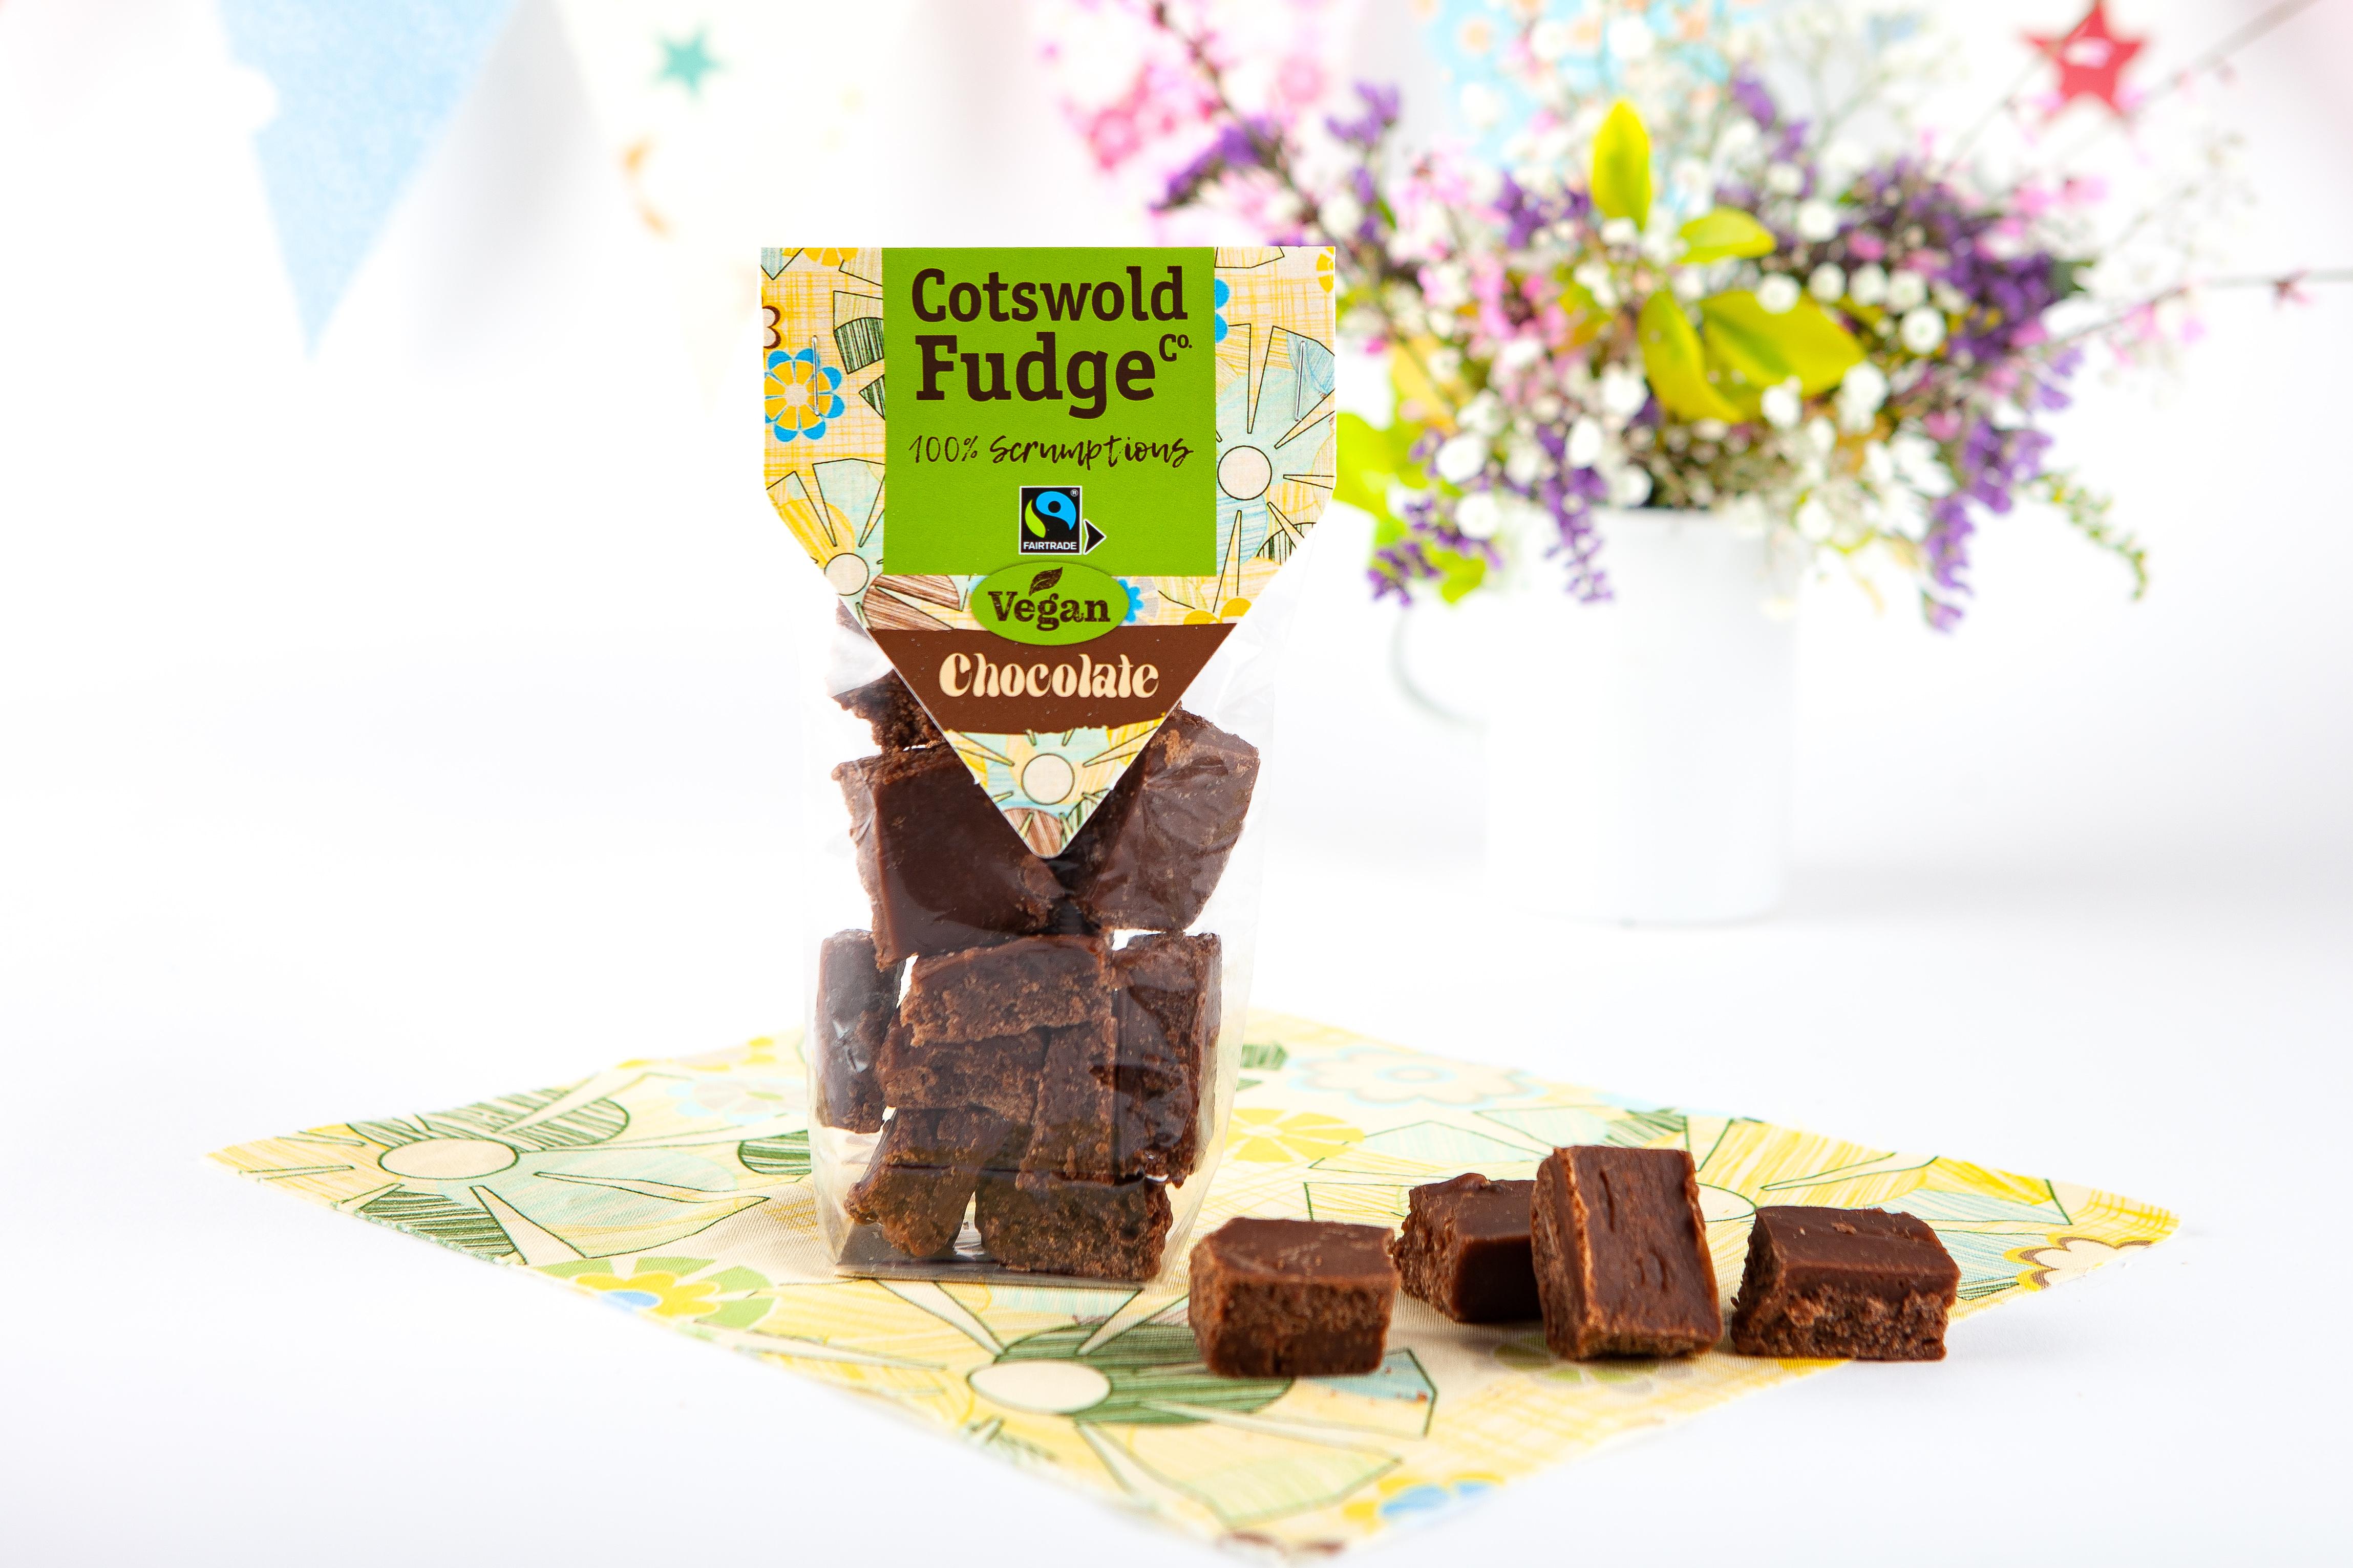 Cotswold Fudge Co Vegan Chocolate